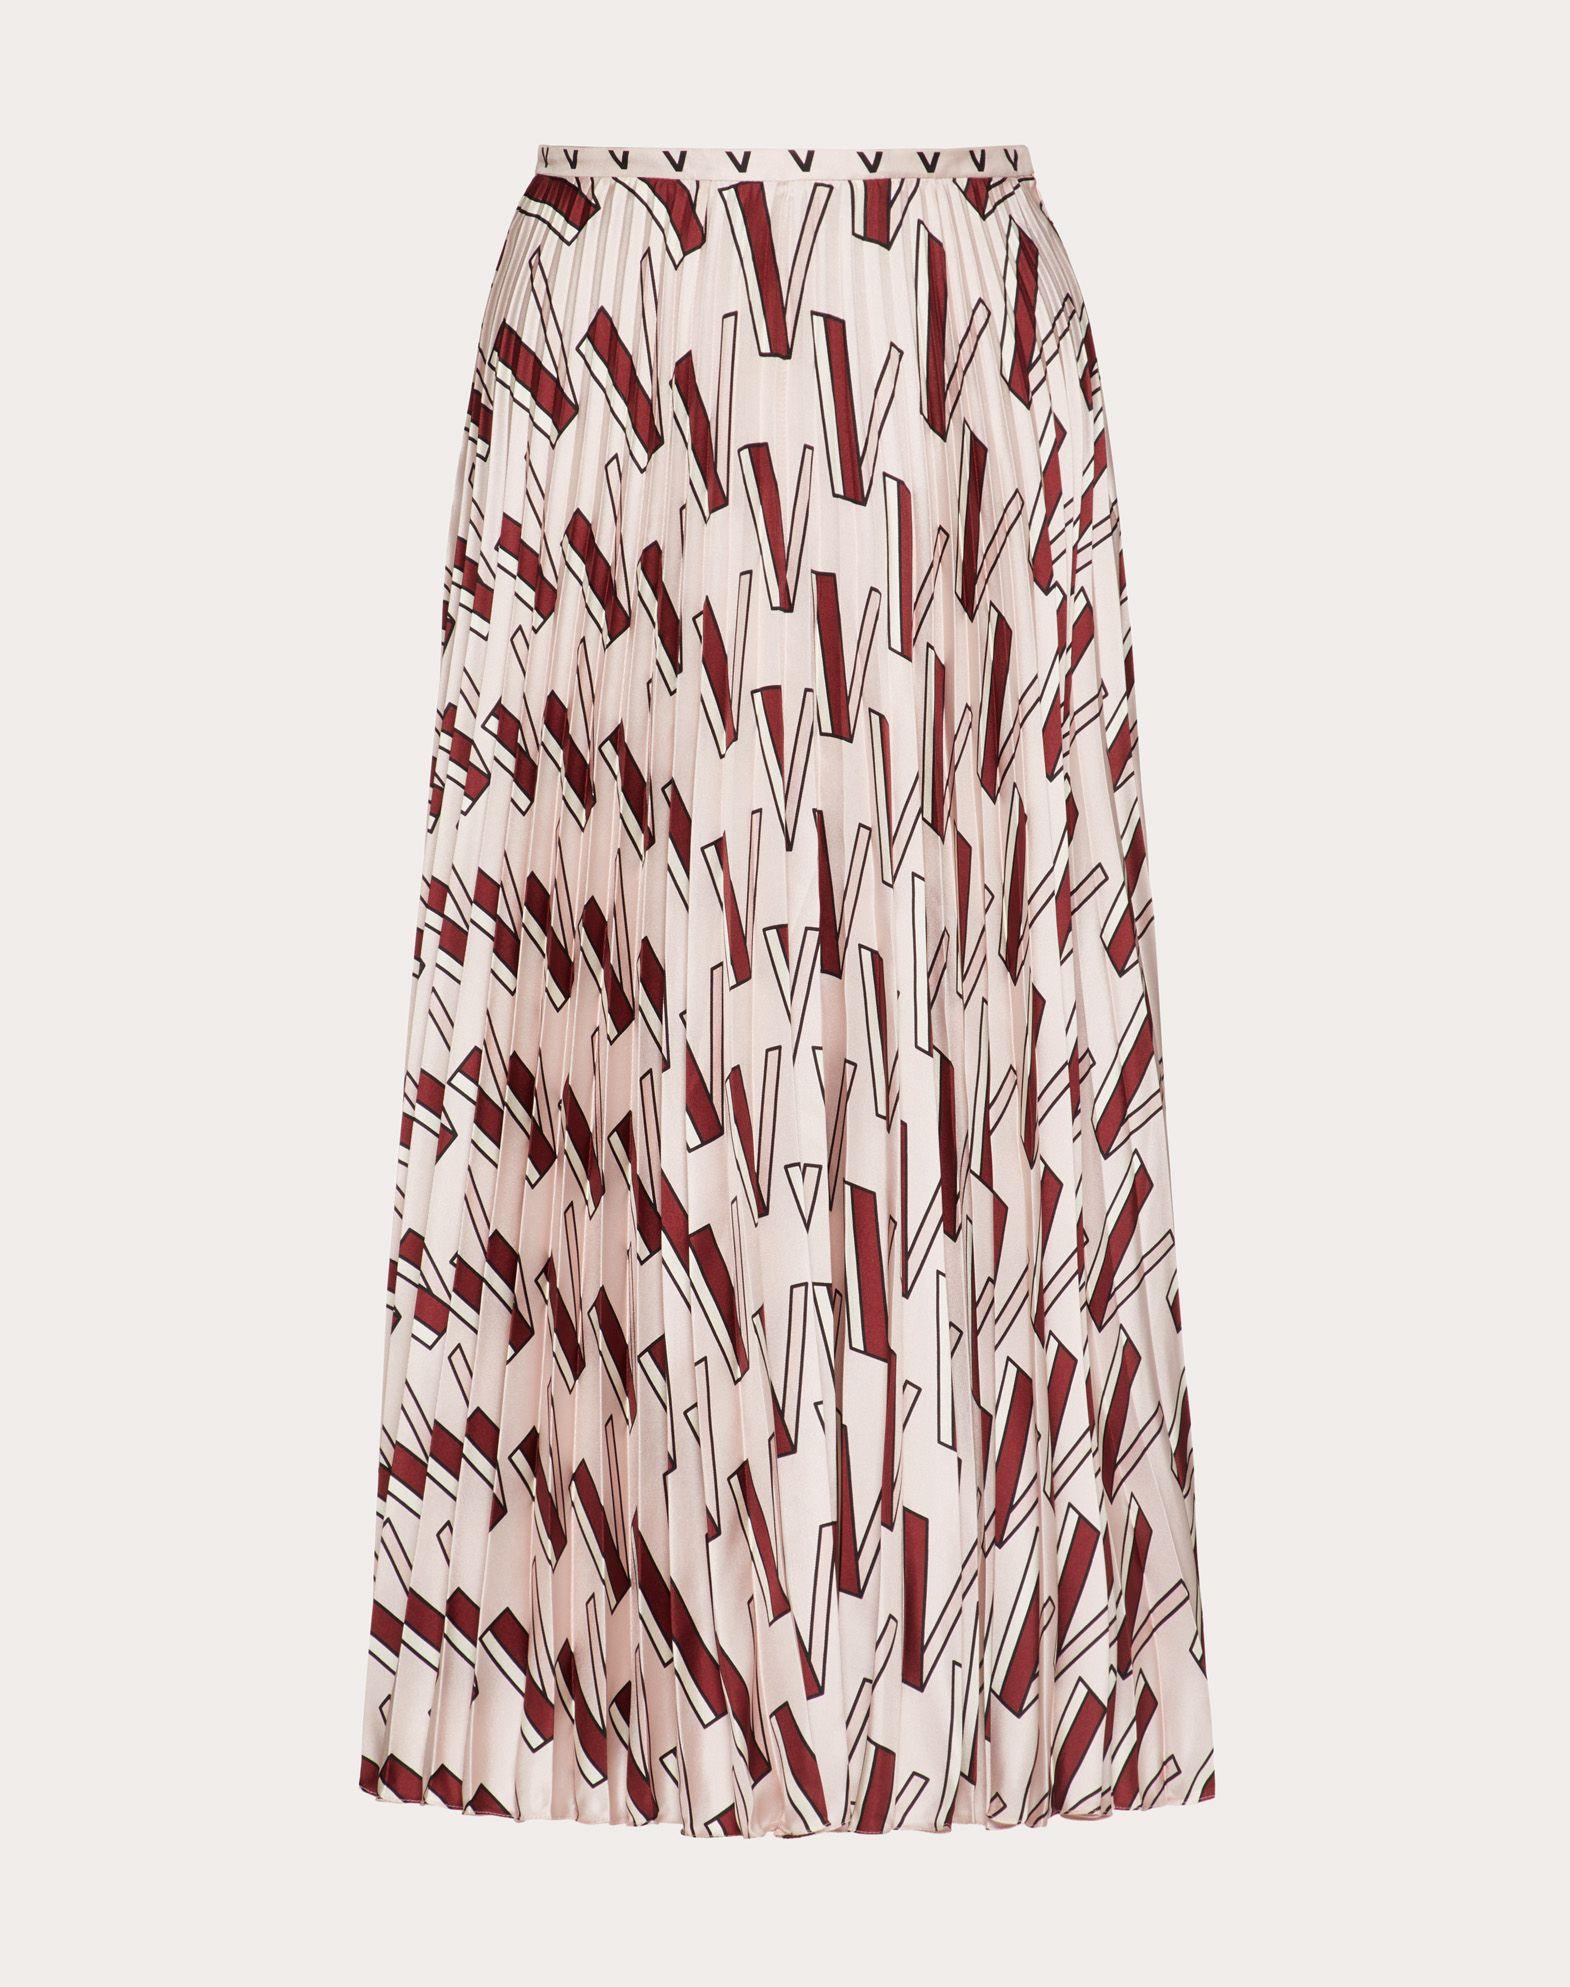 Printed Twill Skirt